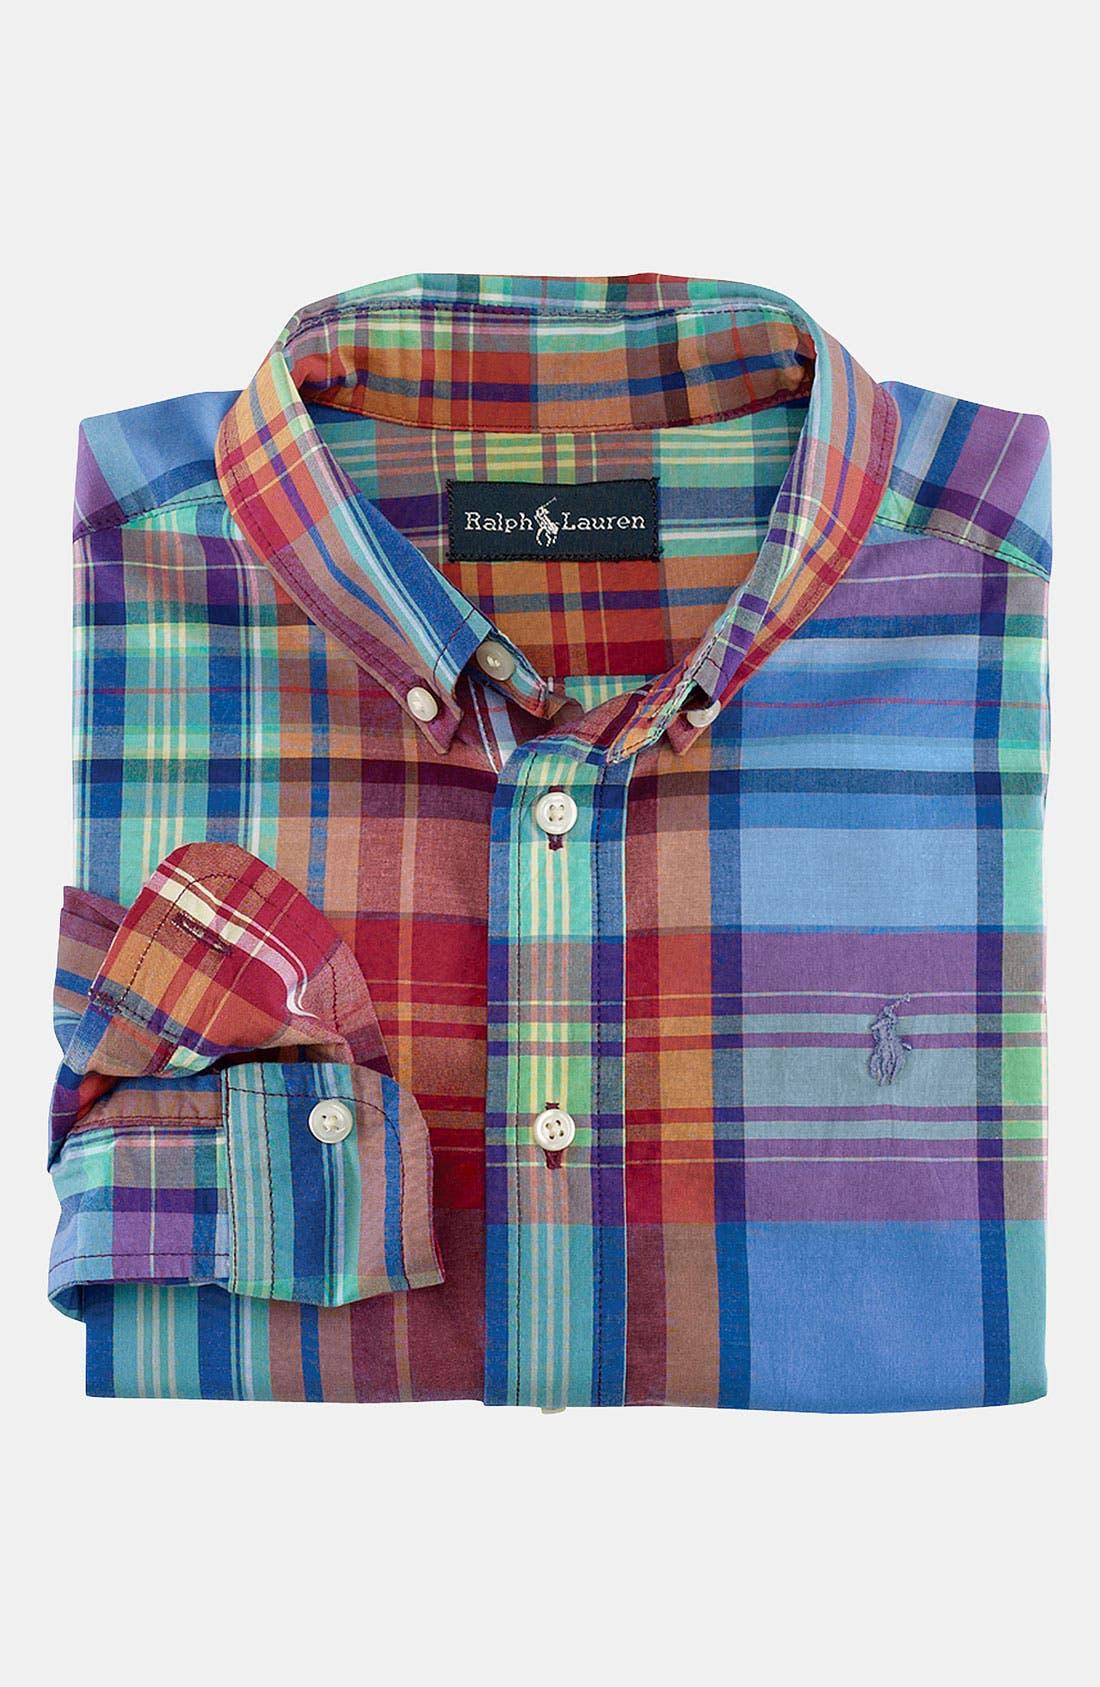 Alternate Image 1 Selected - Ralph Lauren Plaid Shirt (Toddler)